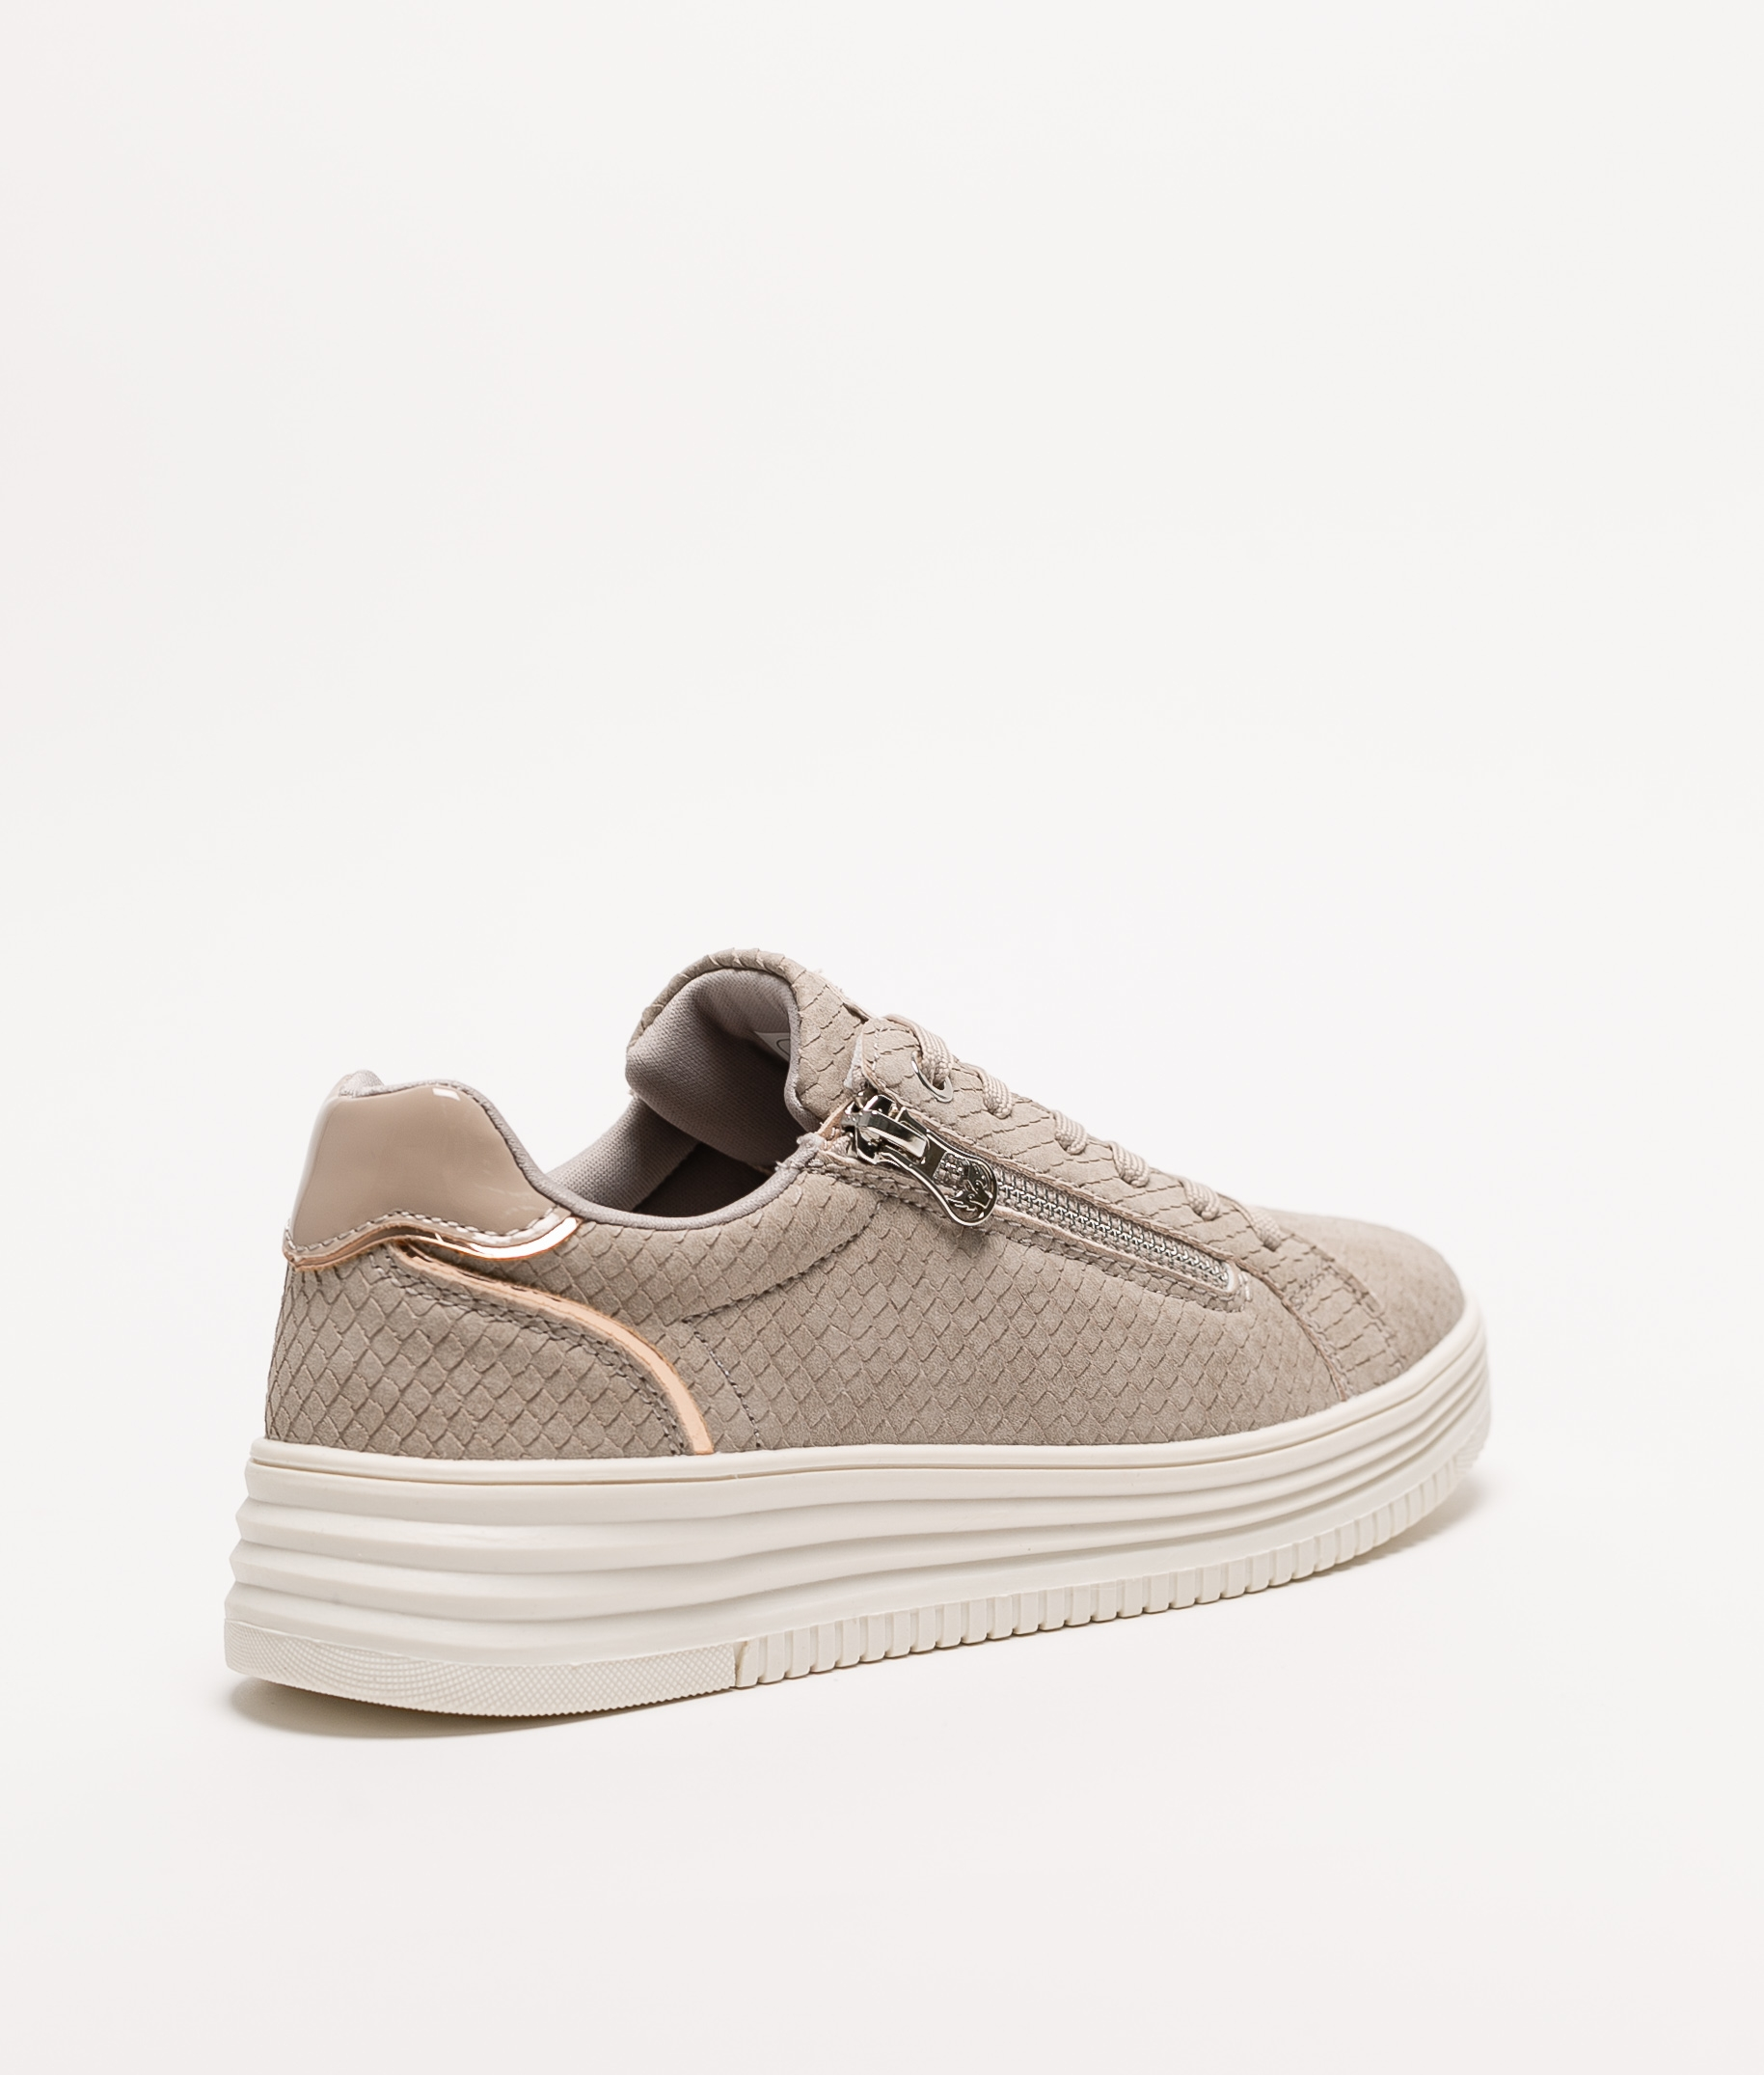 Sneakers Soule Xti - Rosa